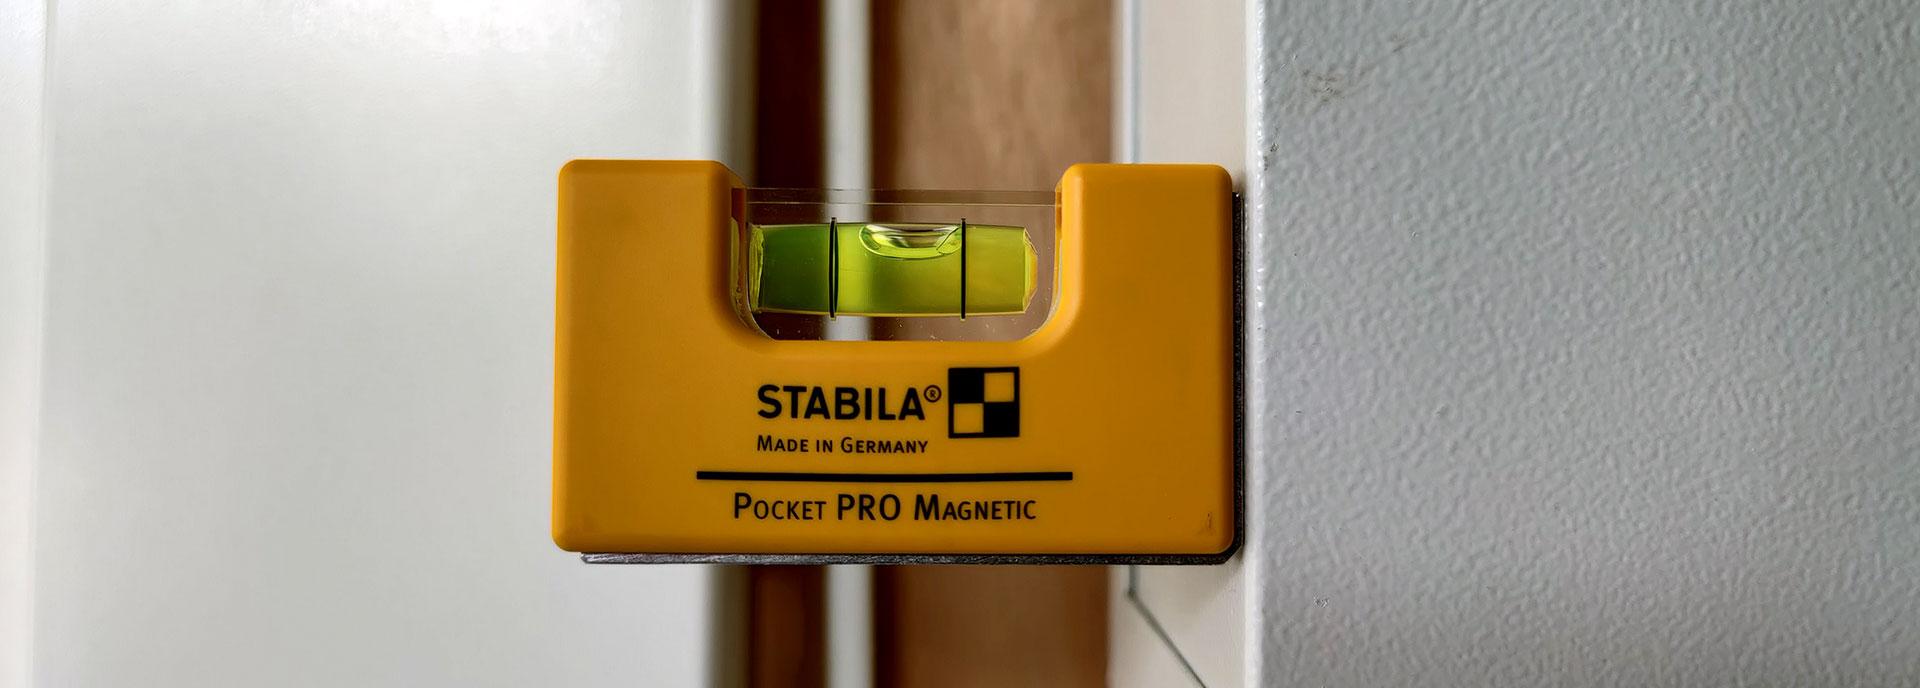 Stabila Pocket Pro Magnetic